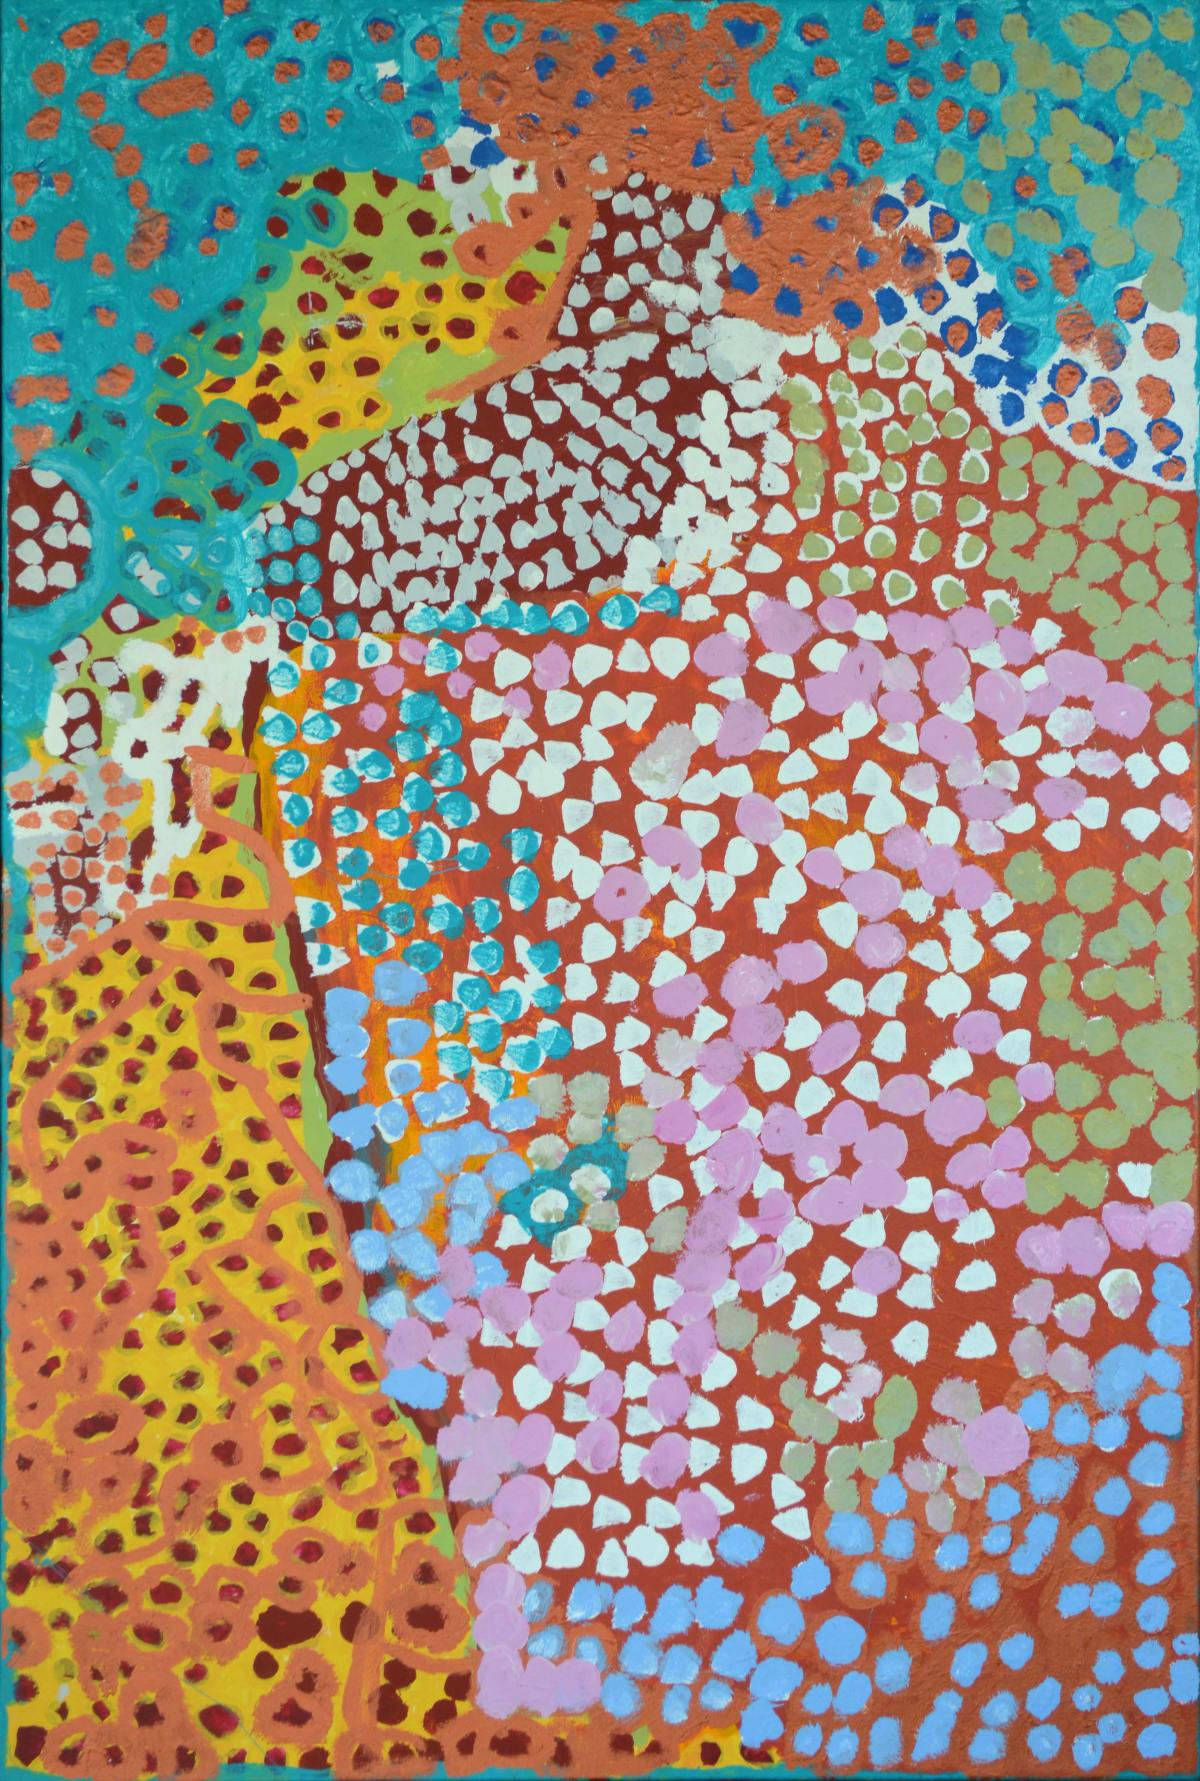 Daisy Japulija No Story This One acrylic on canvas 80 x 120 cm